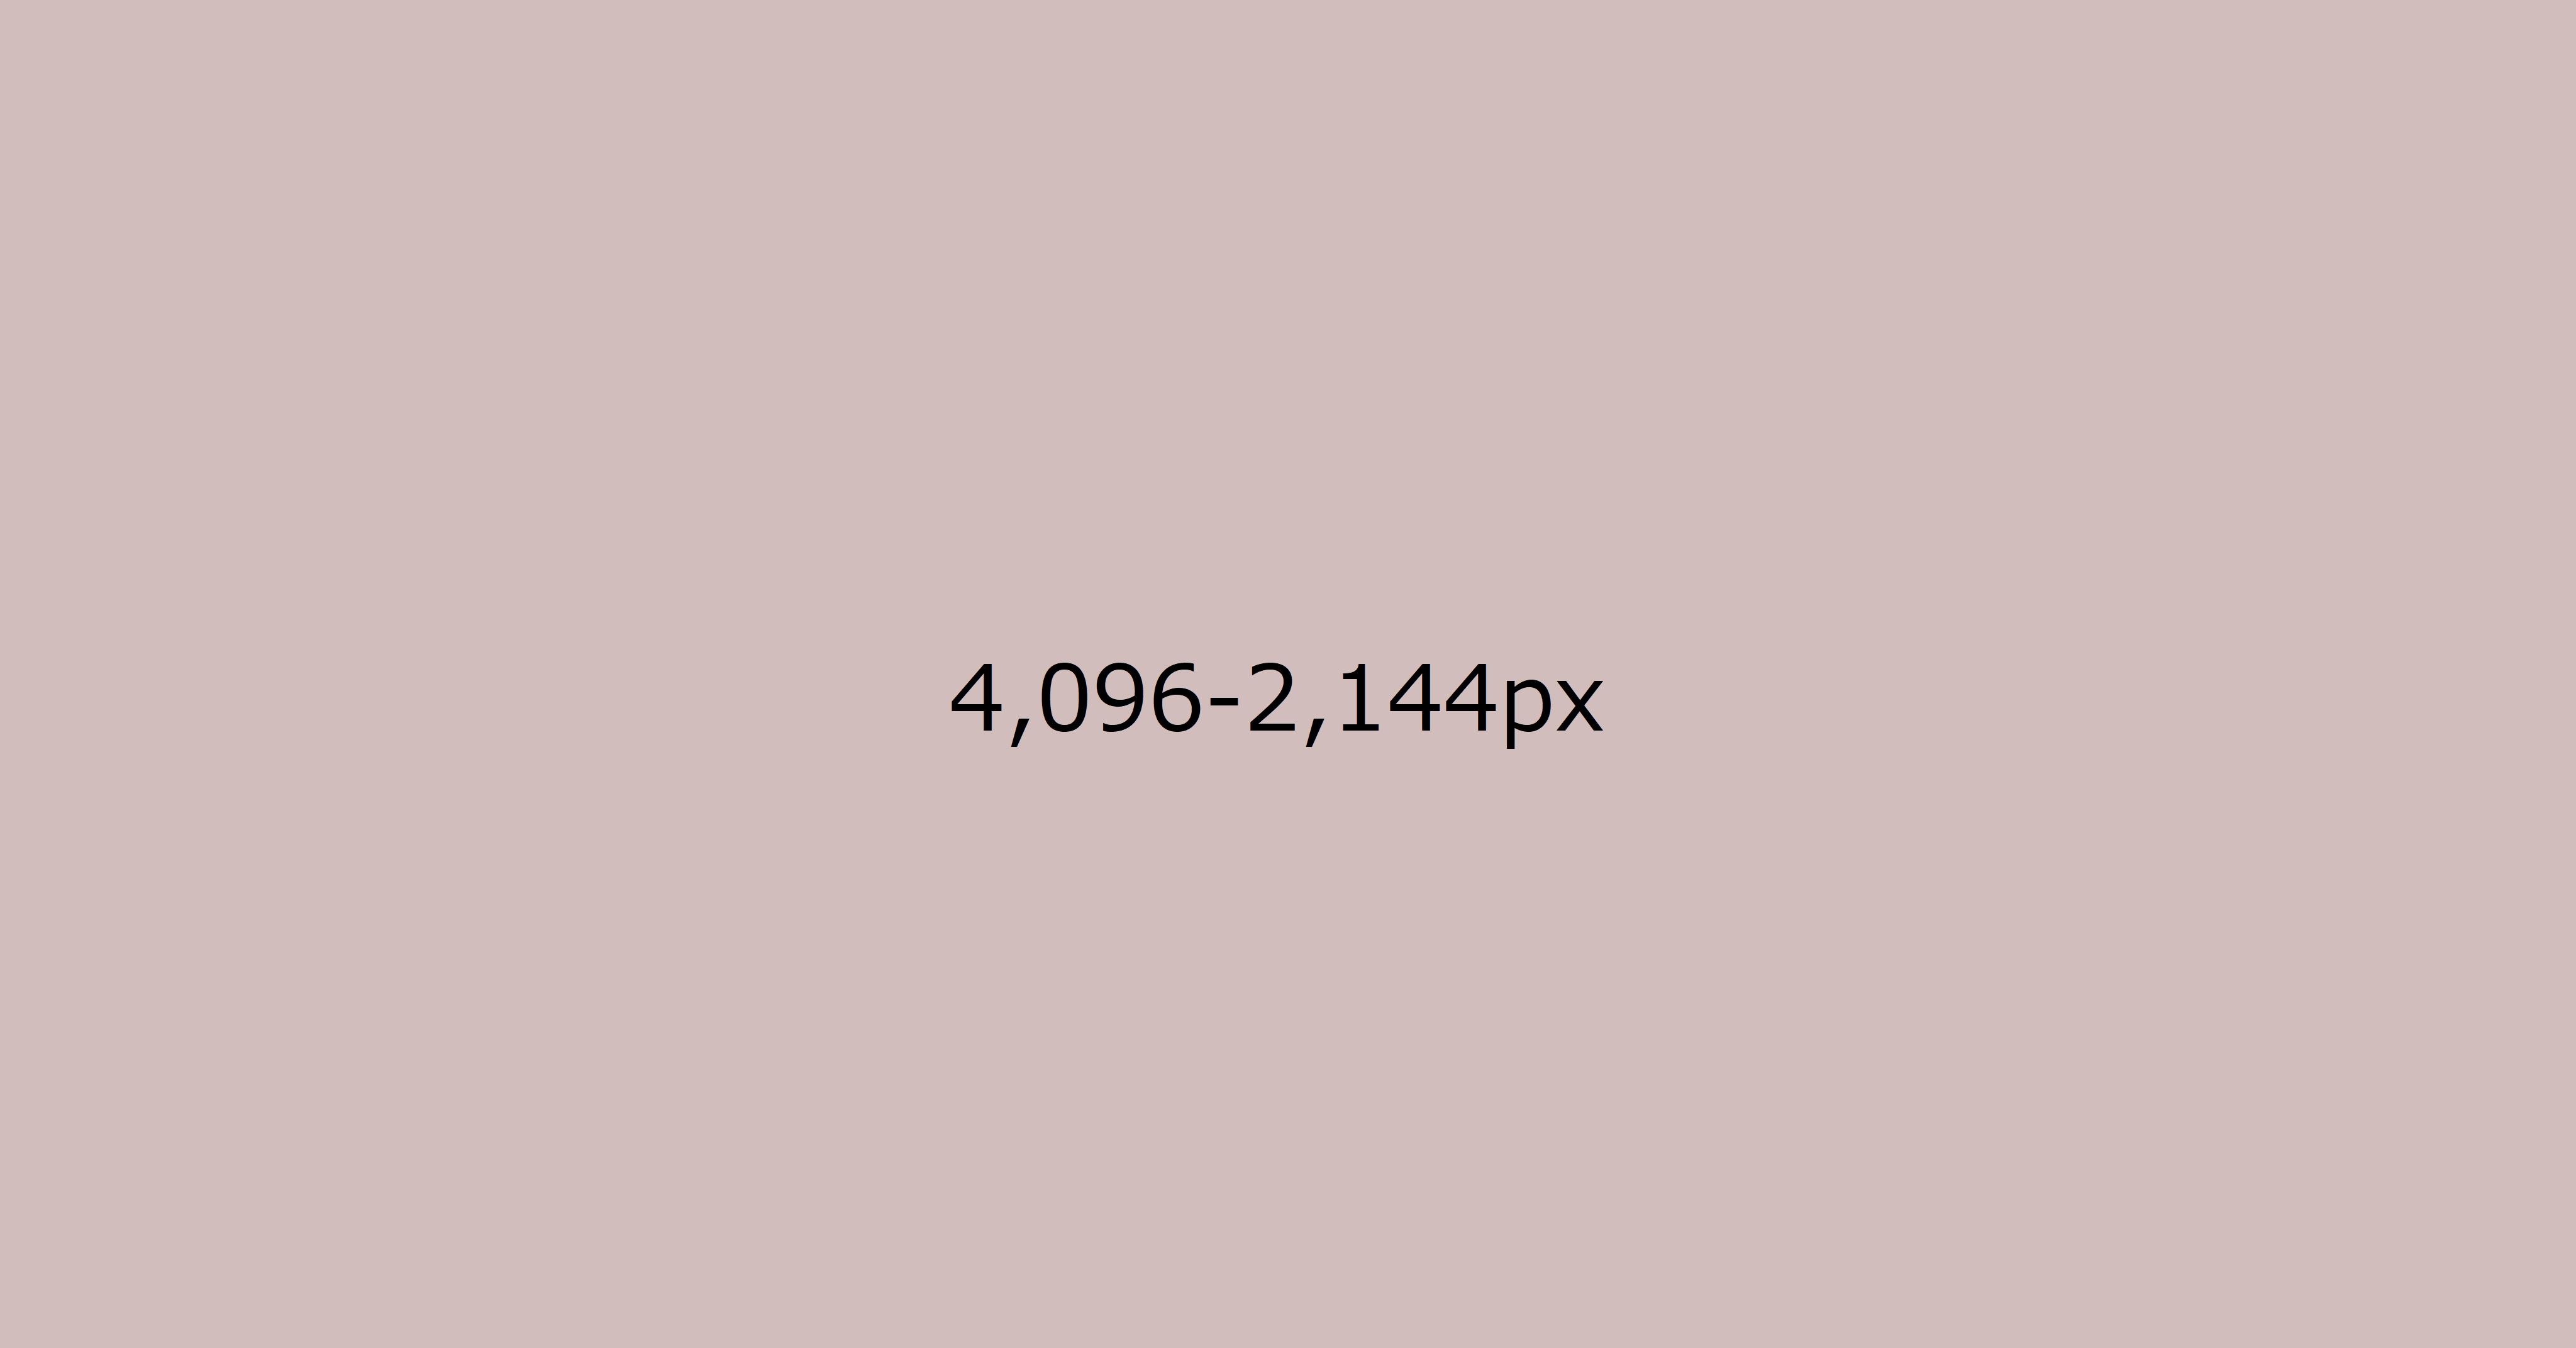 4096-2144_number